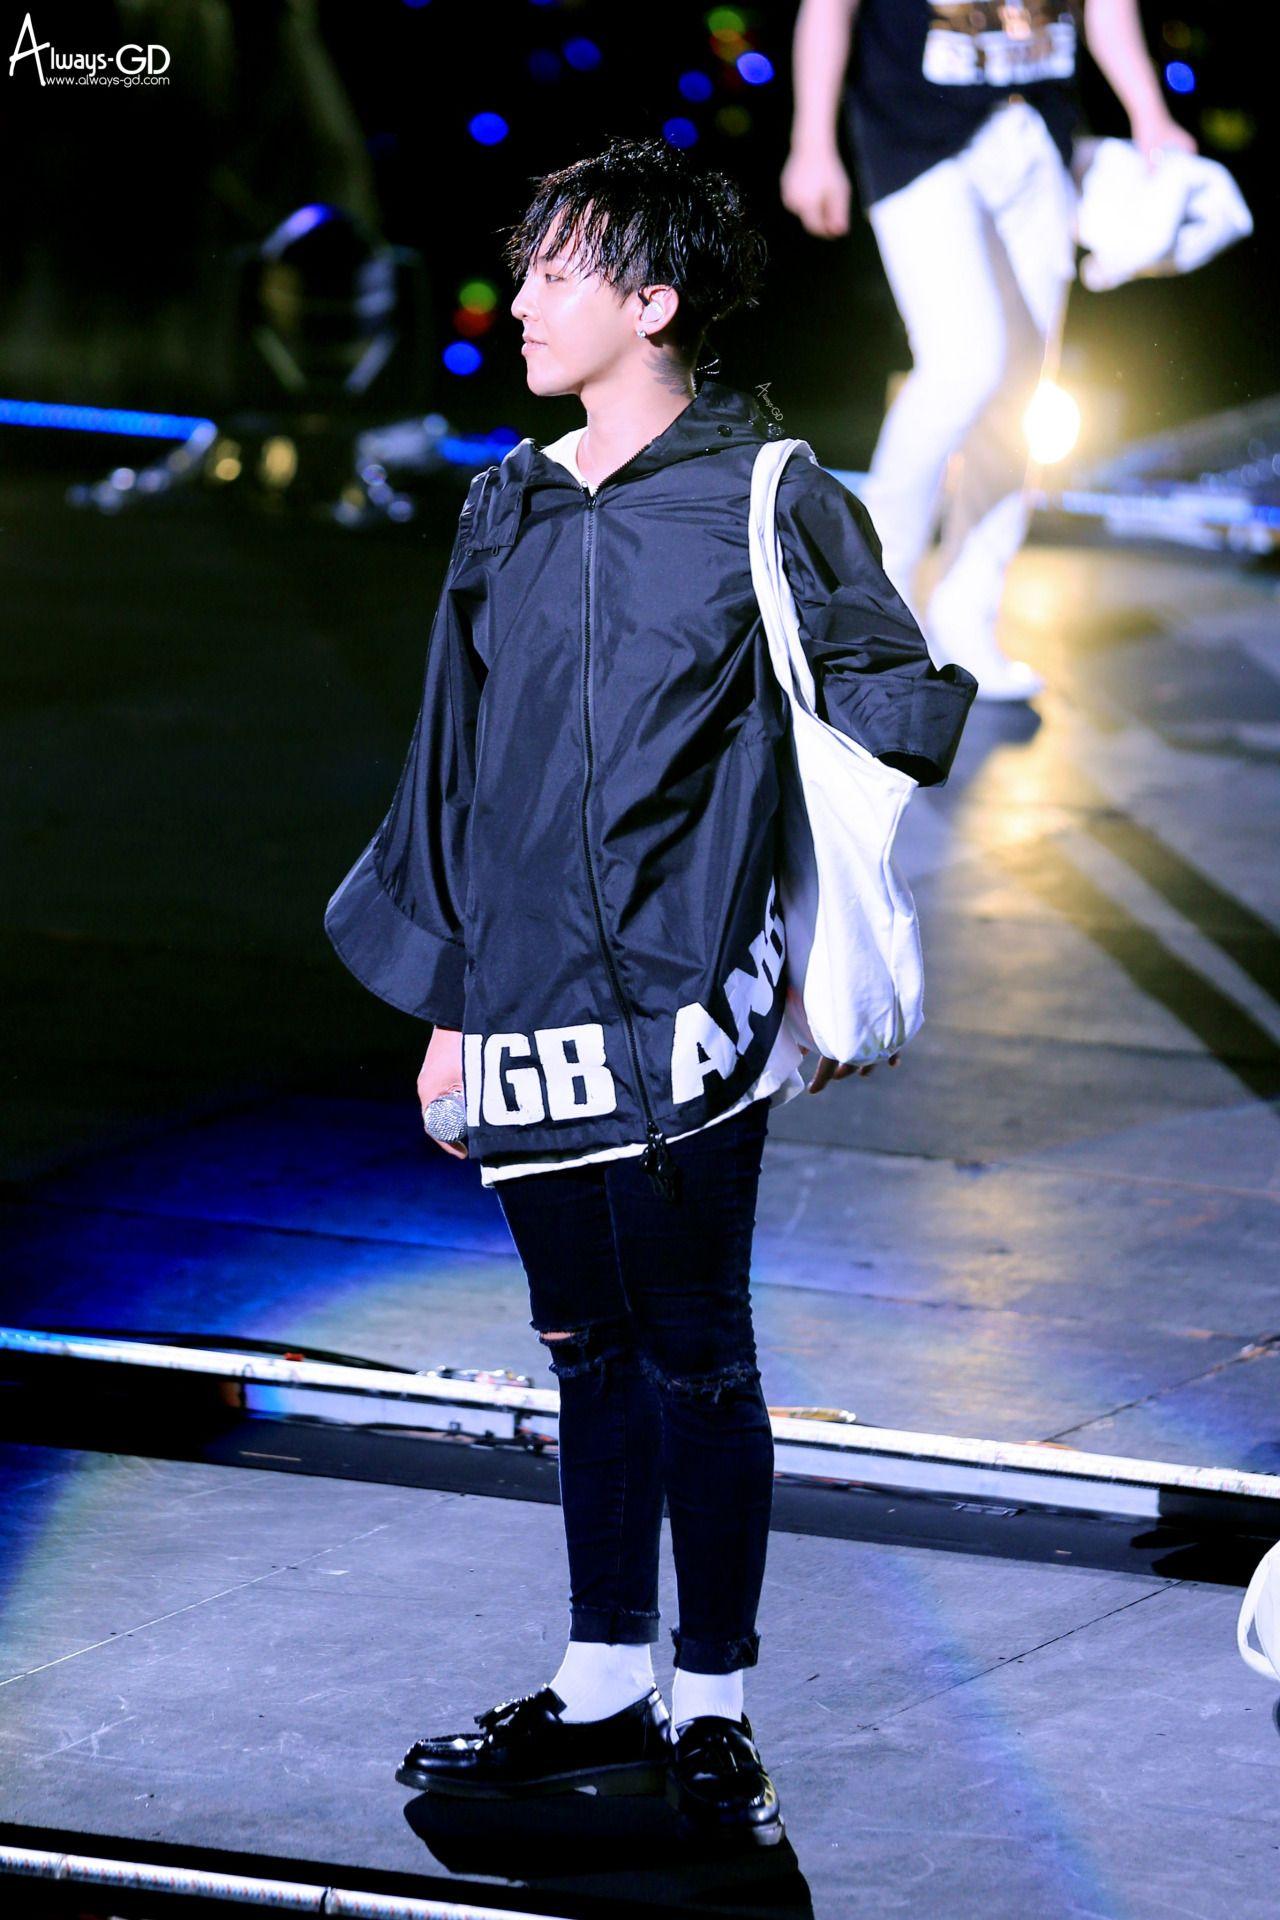 160731 G-Dragon - BIGBANG10 the CONCERT: 0.TO.10 in Japan